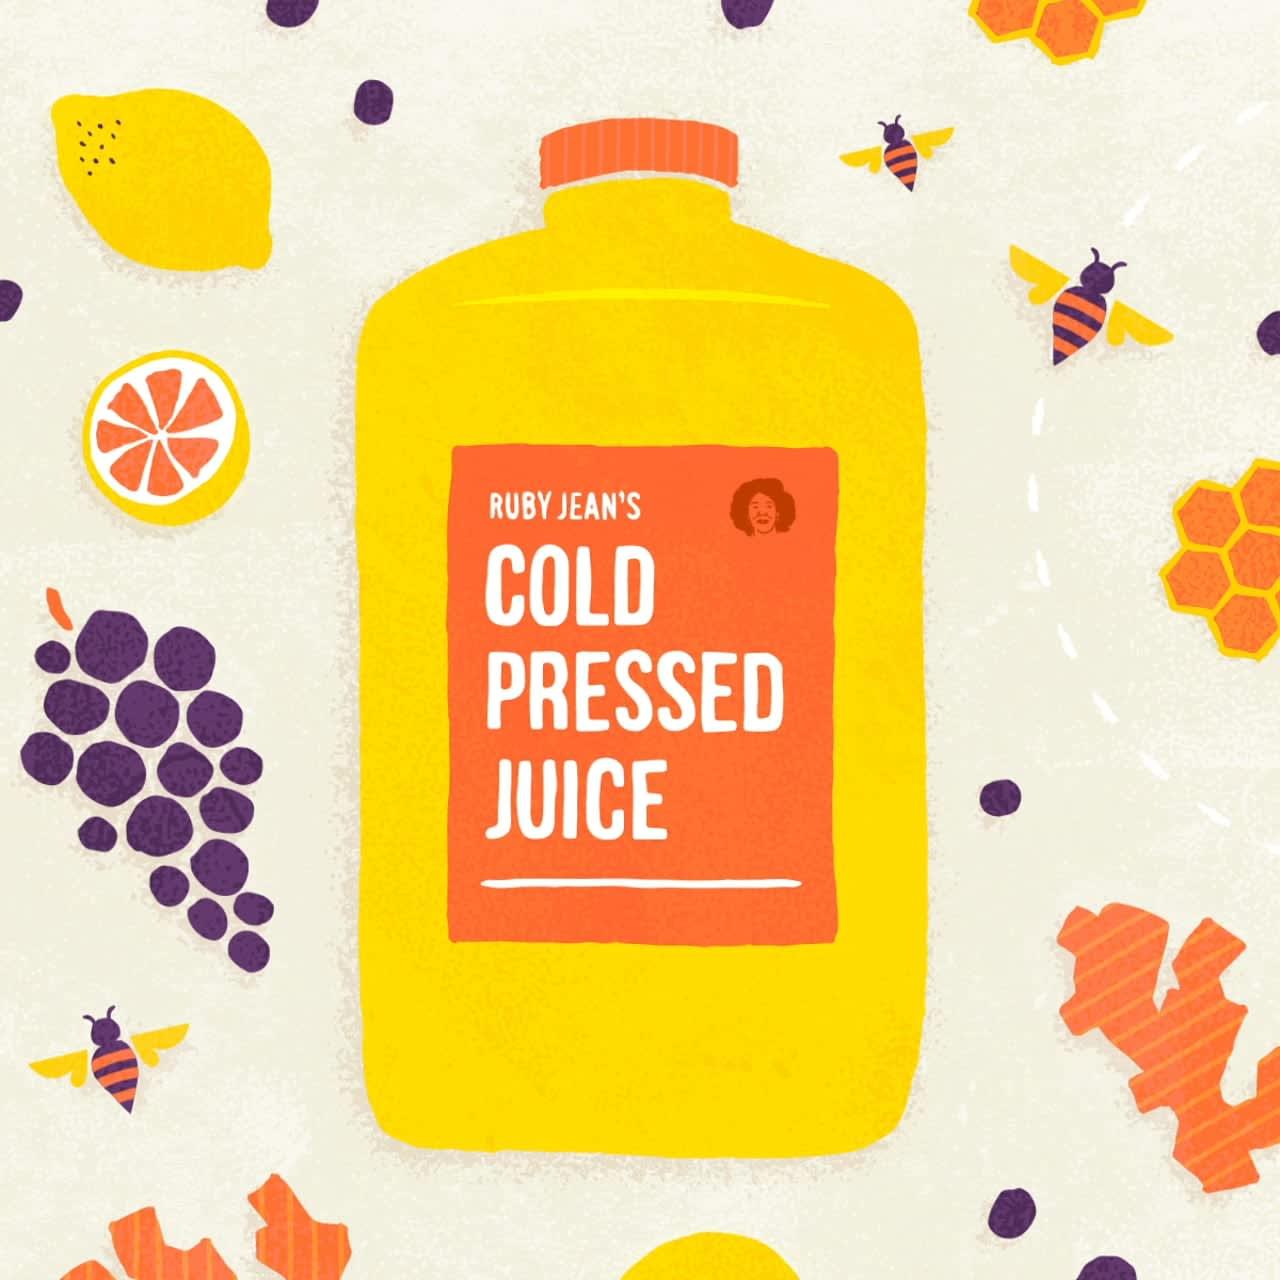 Ruby Jean's Immunity Lemonade